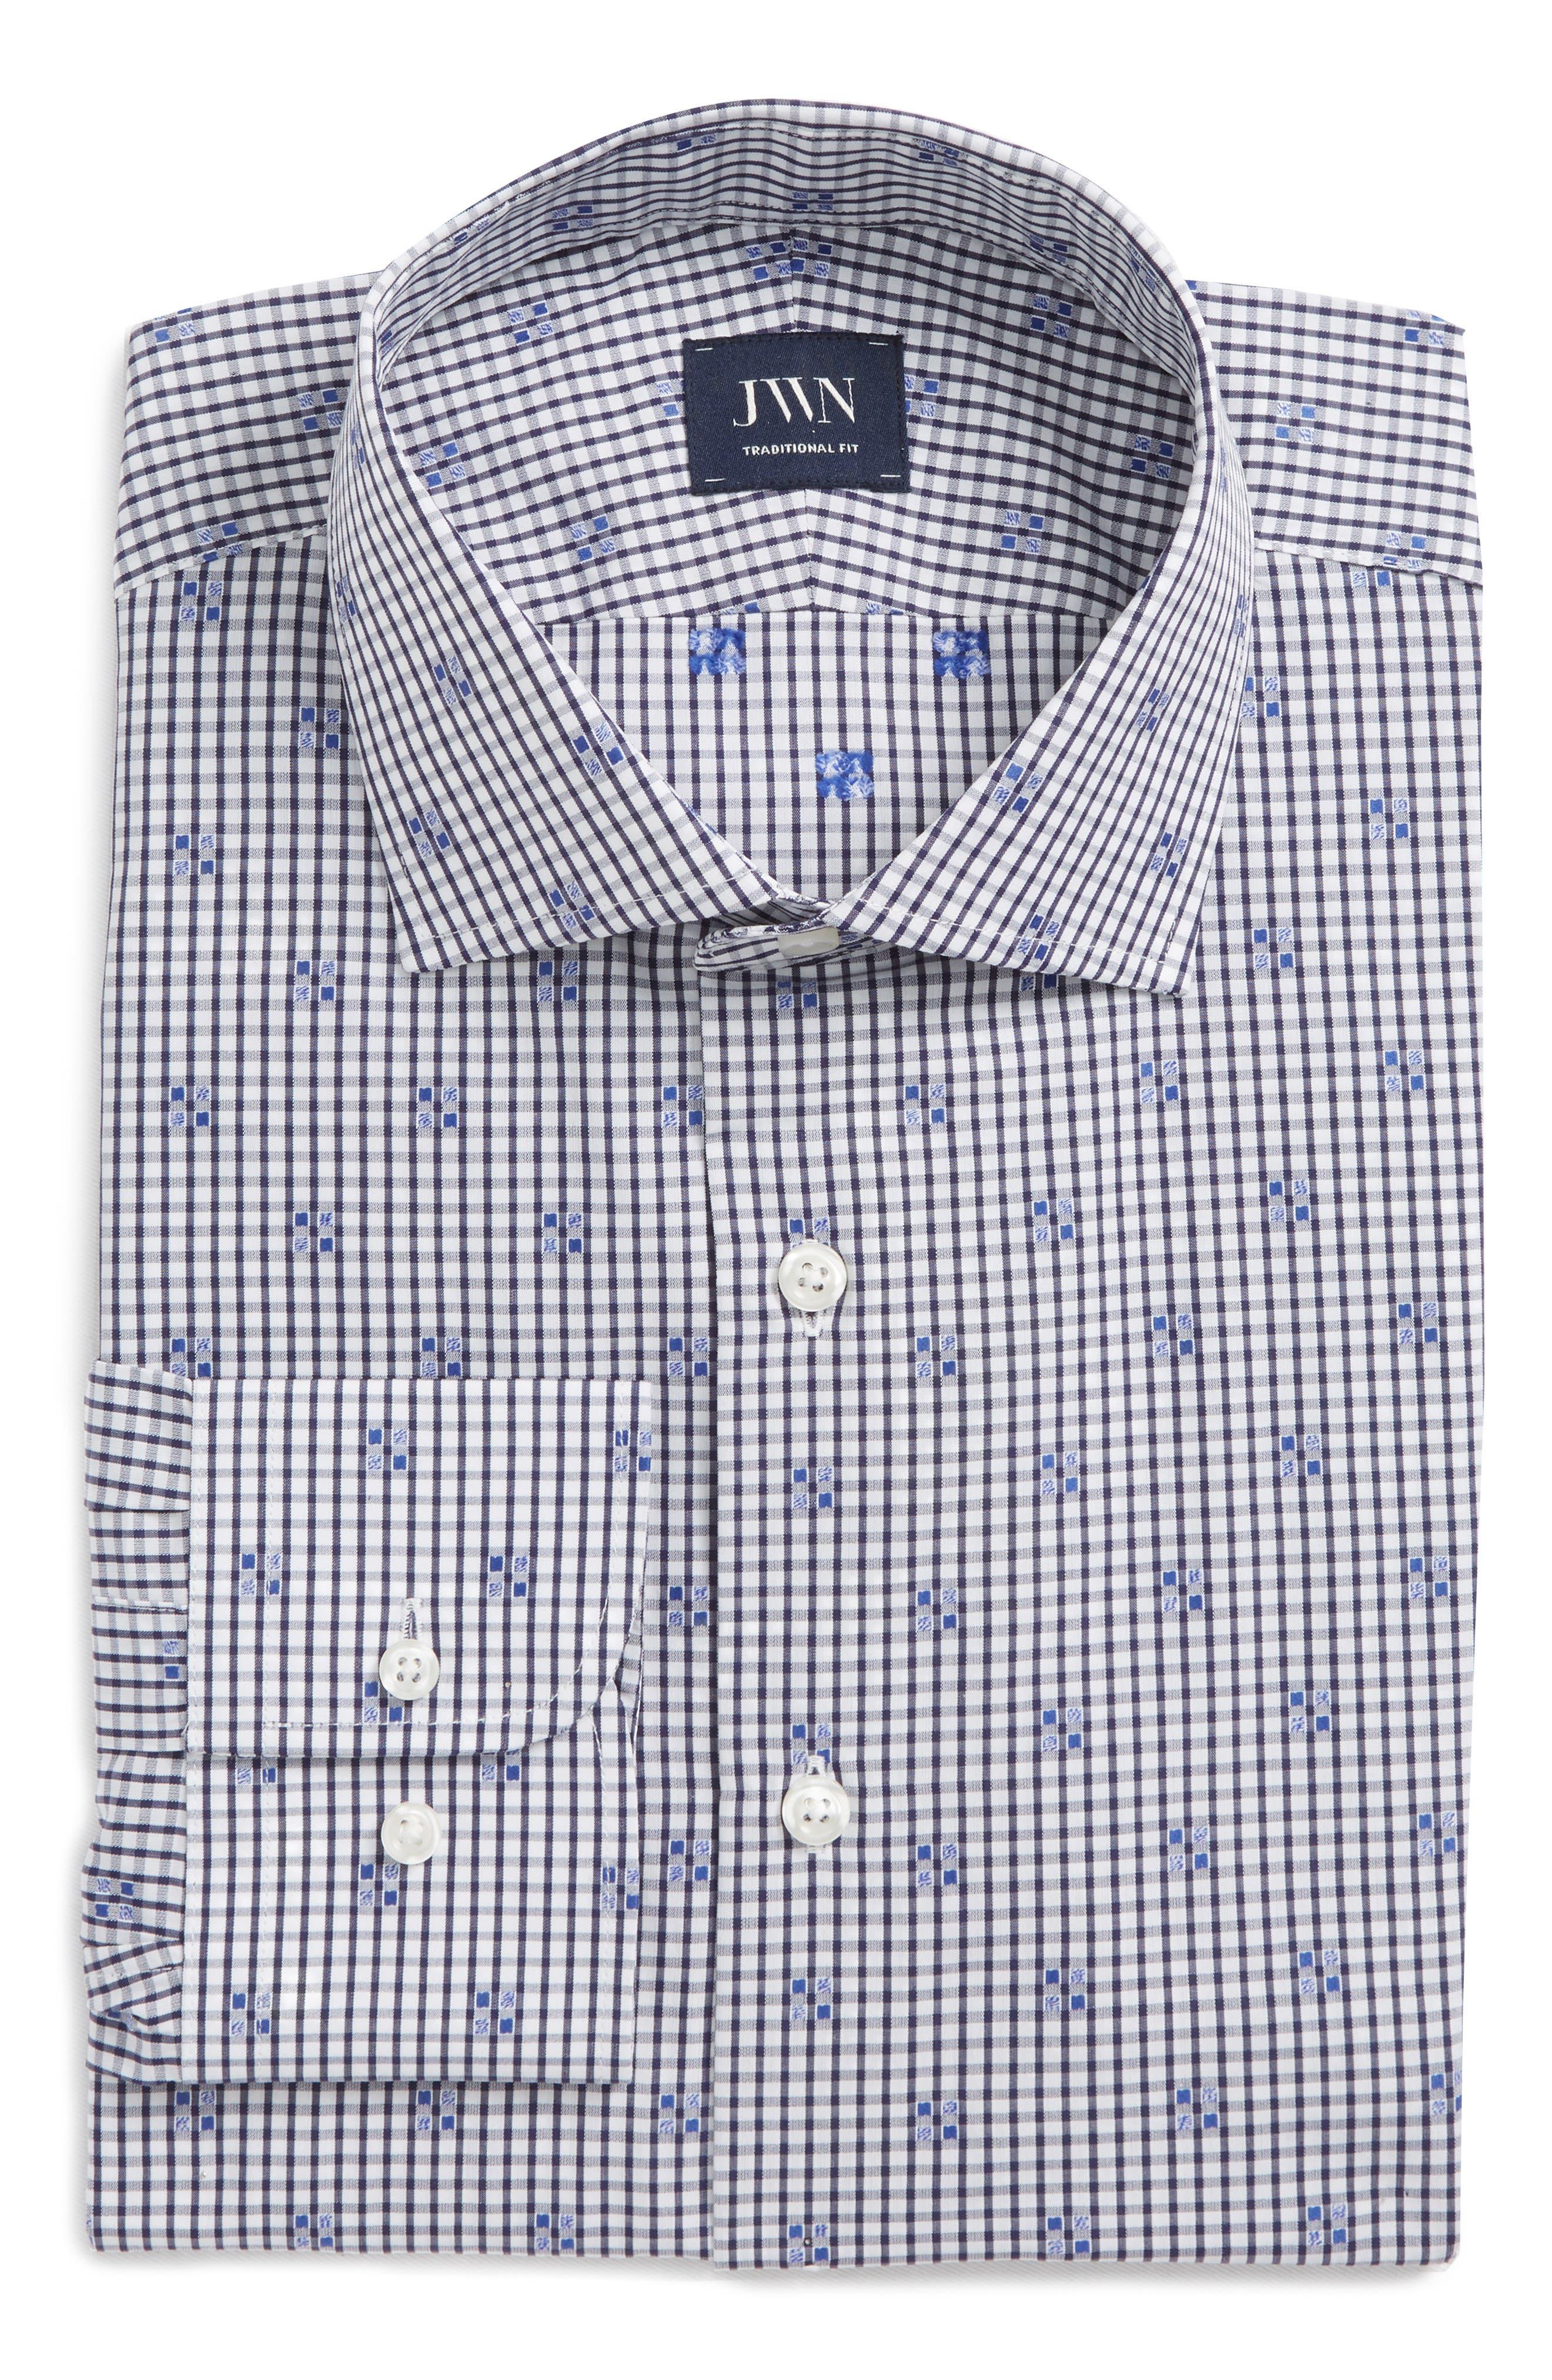 Trim Fit Check Dress Shirt,                             Alternate thumbnail 6, color,                             Navy Iris